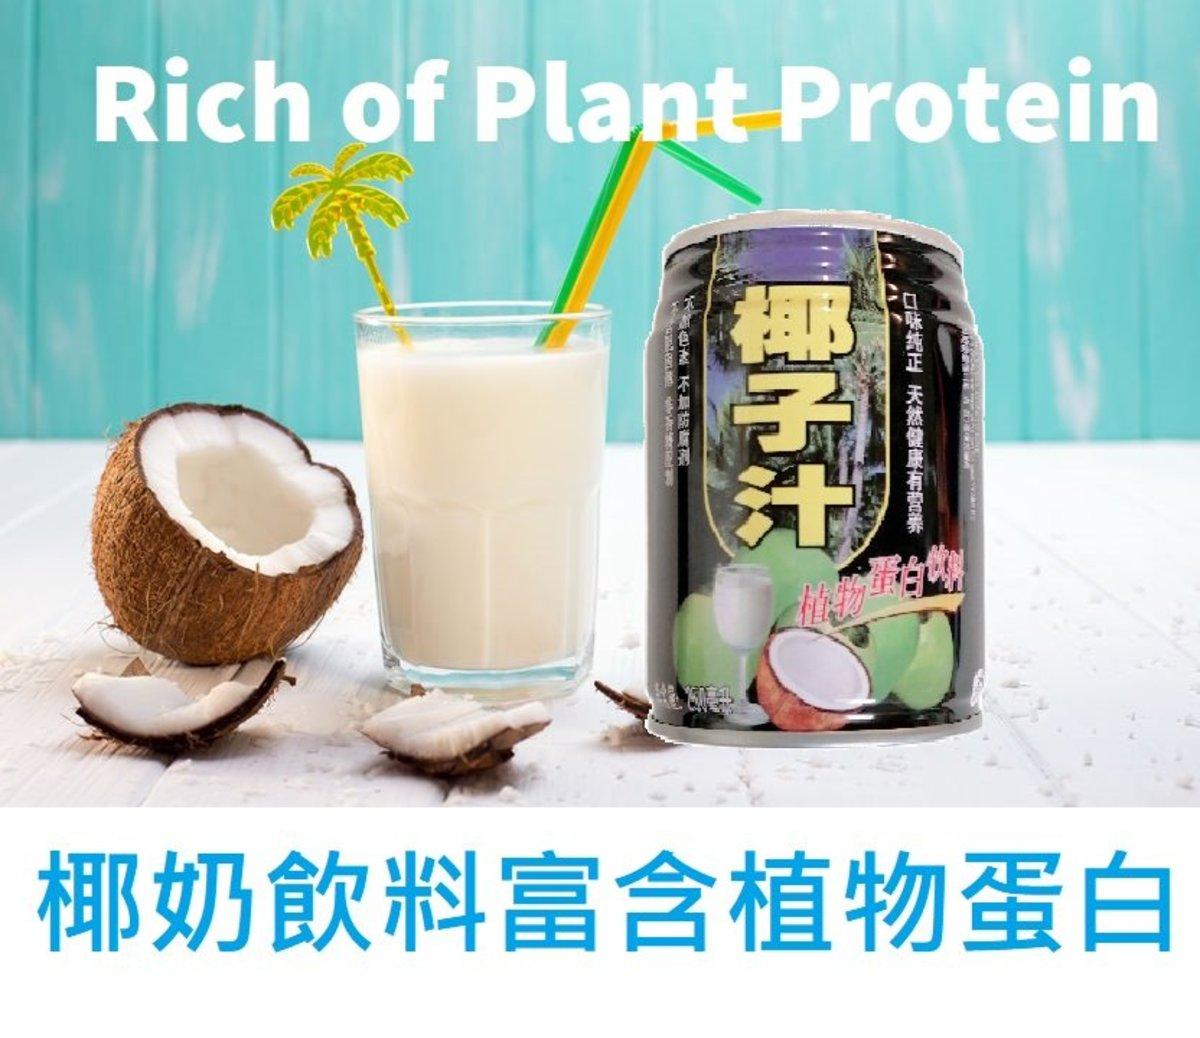 Bingo Coconut Milk Drinks (250ml x 3bottles)